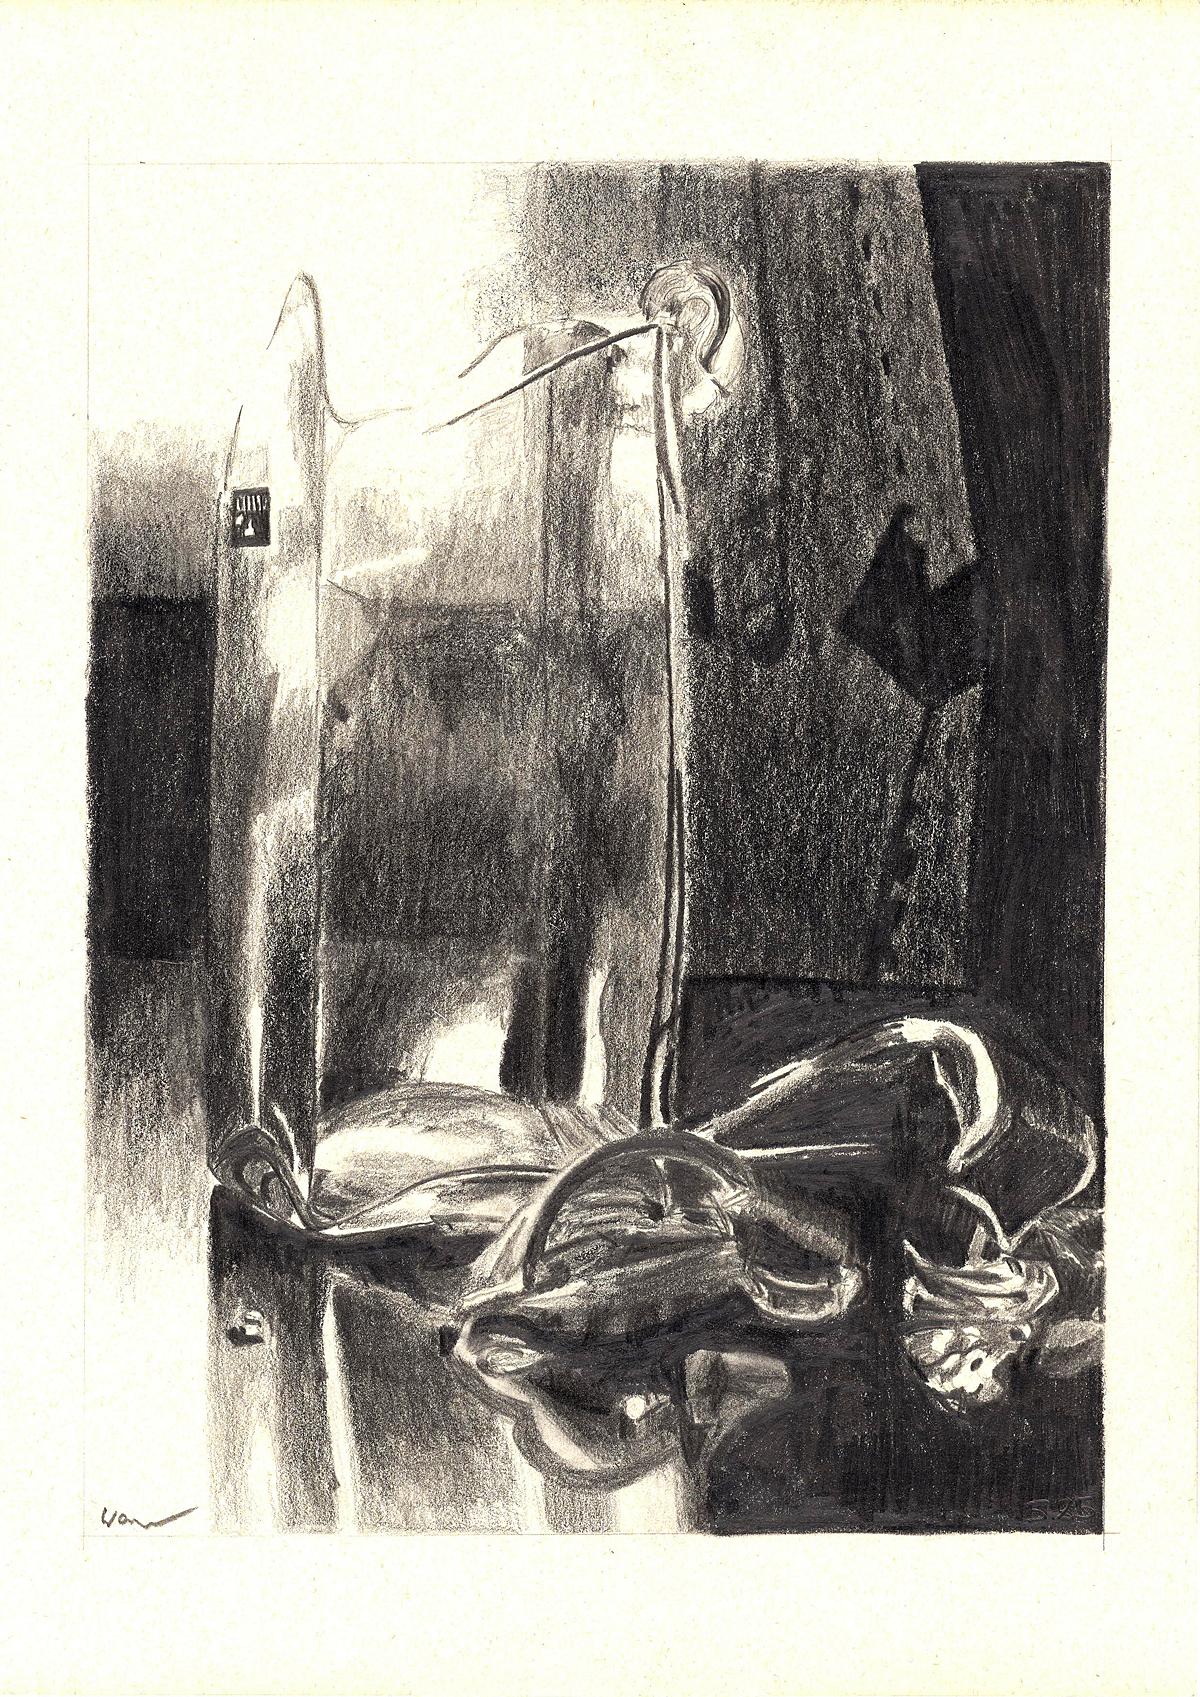 Zerbrochene Vase (1985)